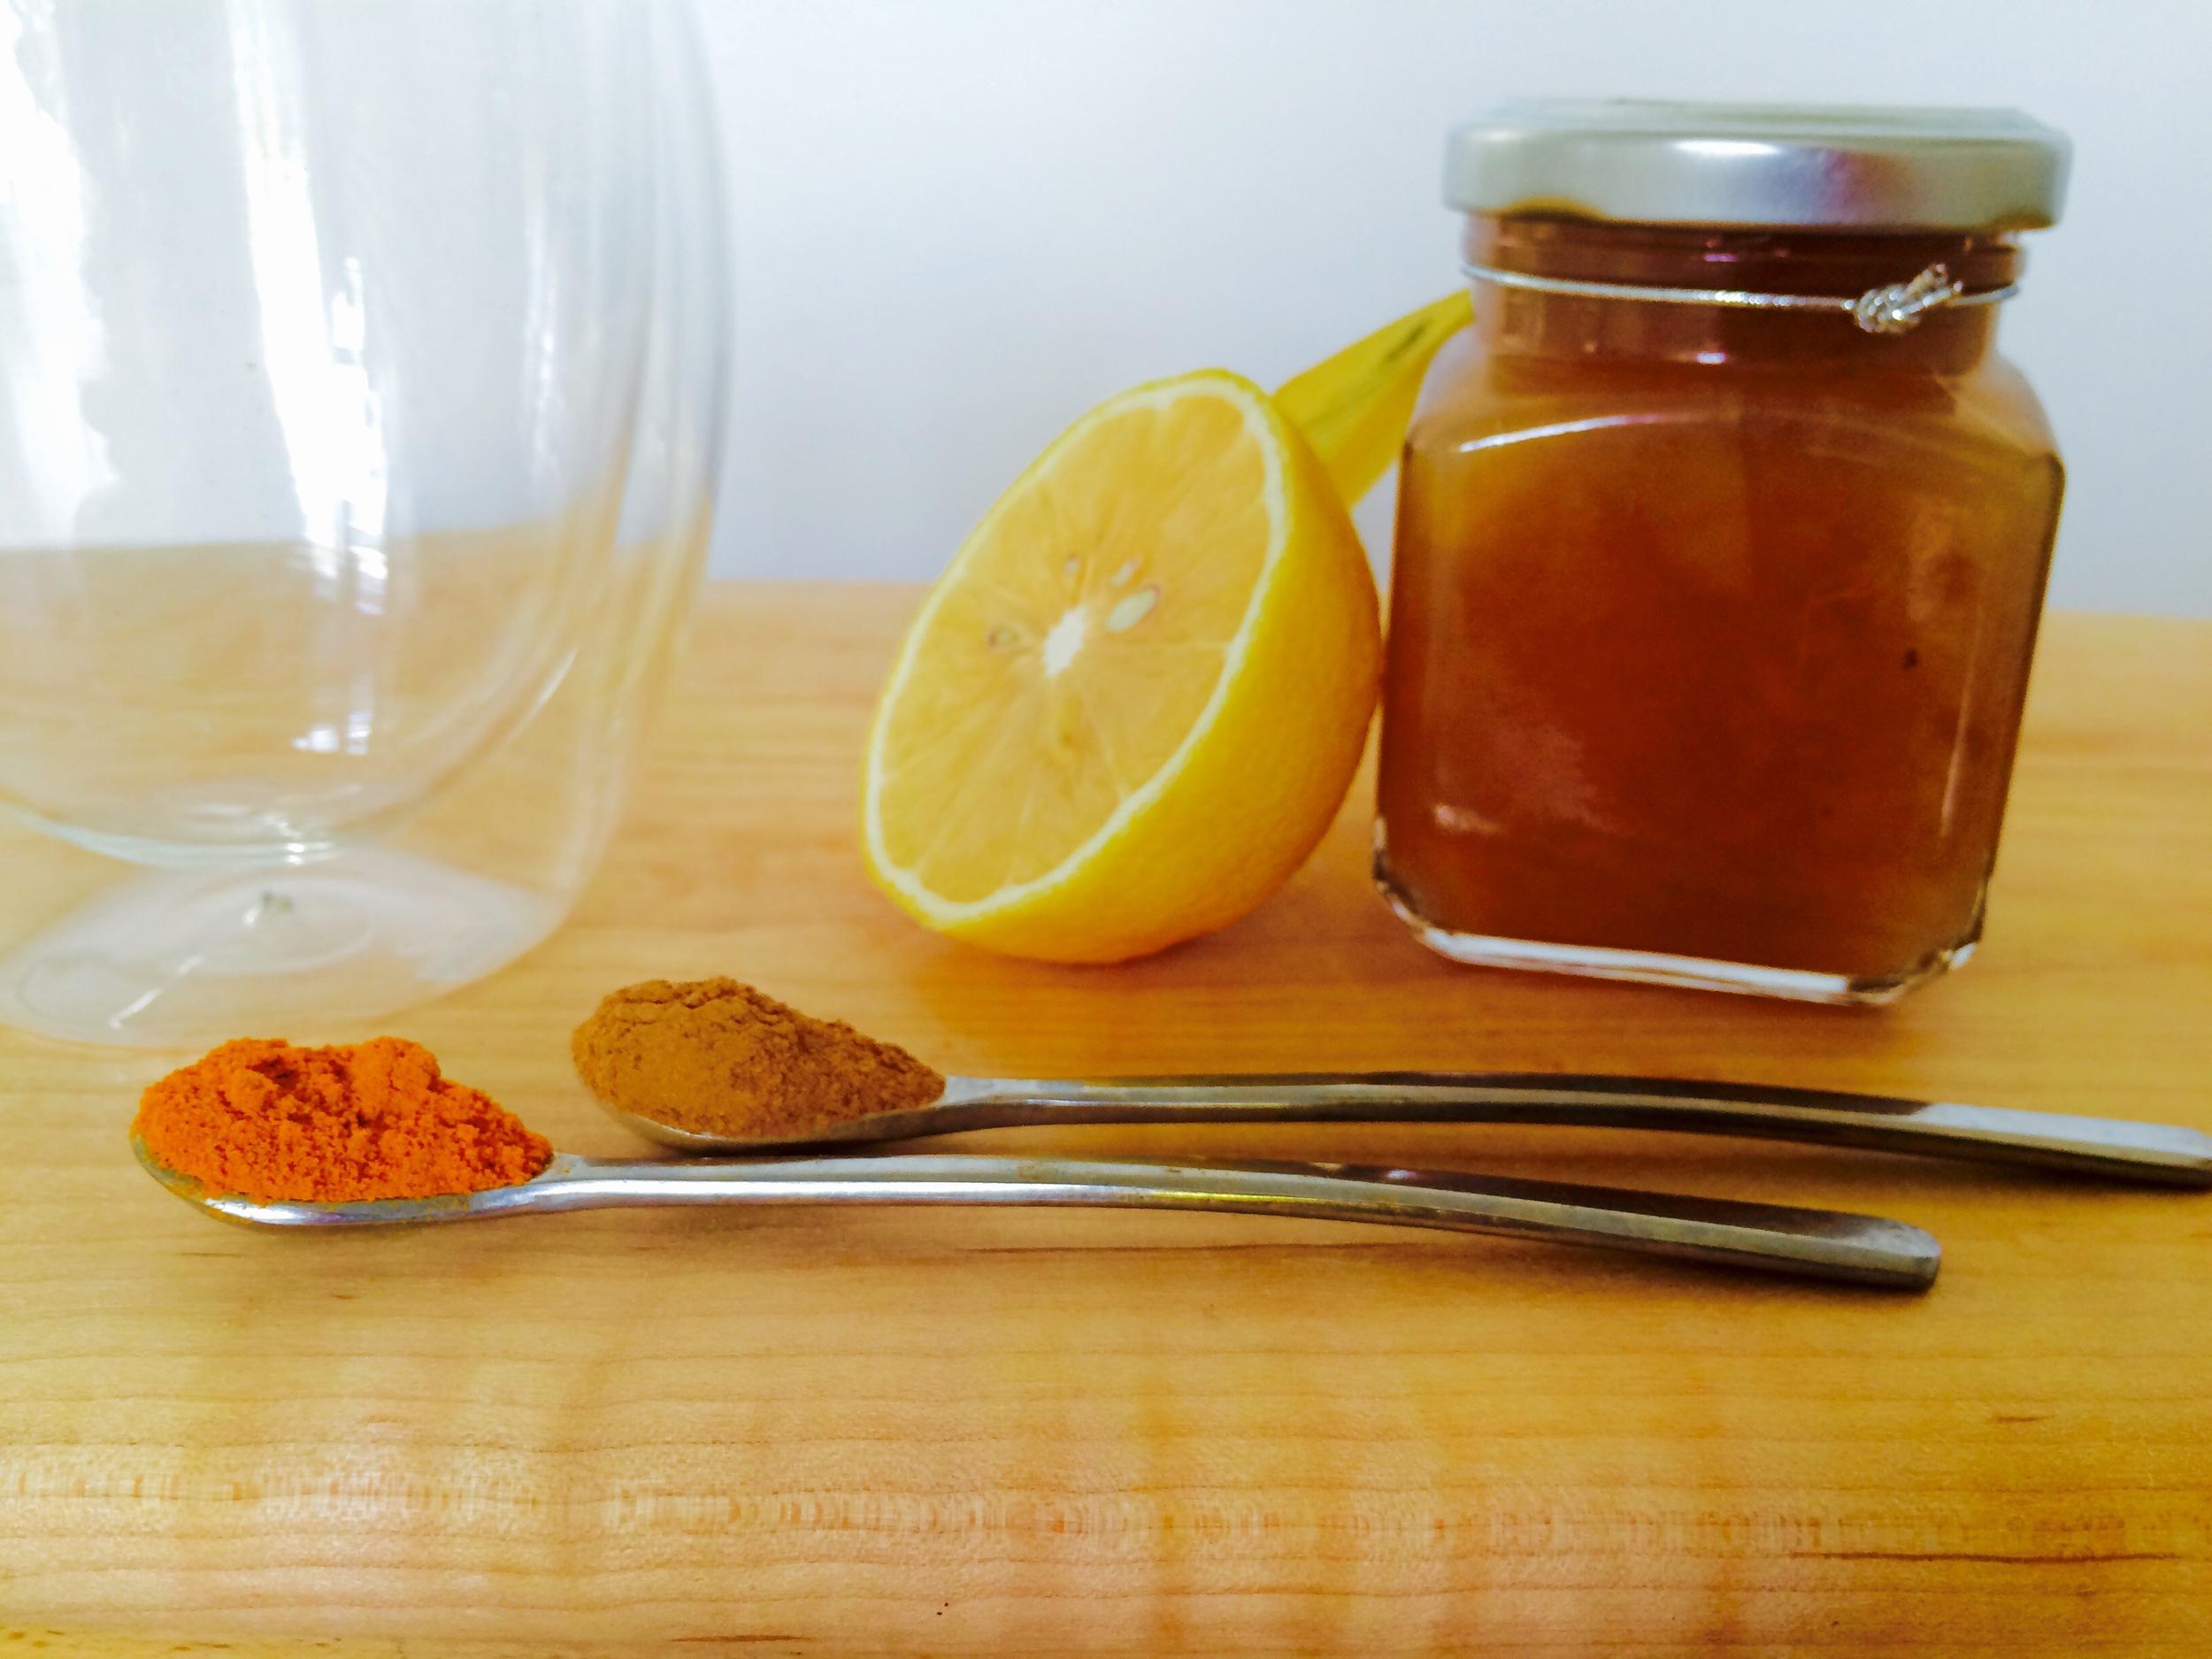 Turmeric Lemon Cinnamon tea healthy food - 3 Days*